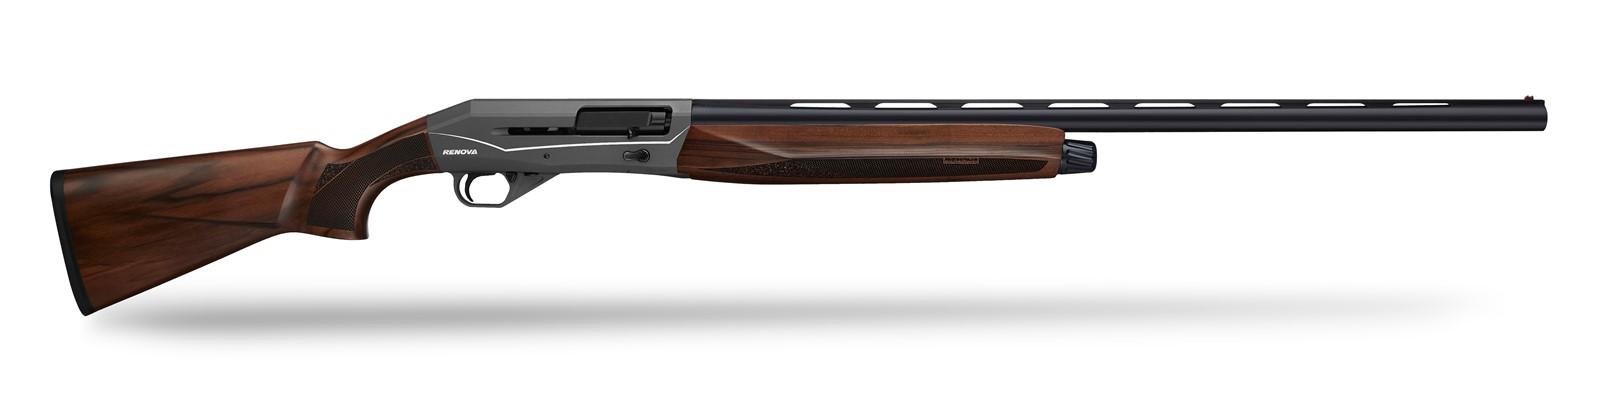 HUGLU Renova Silver 12g Semi Auto Shotgun